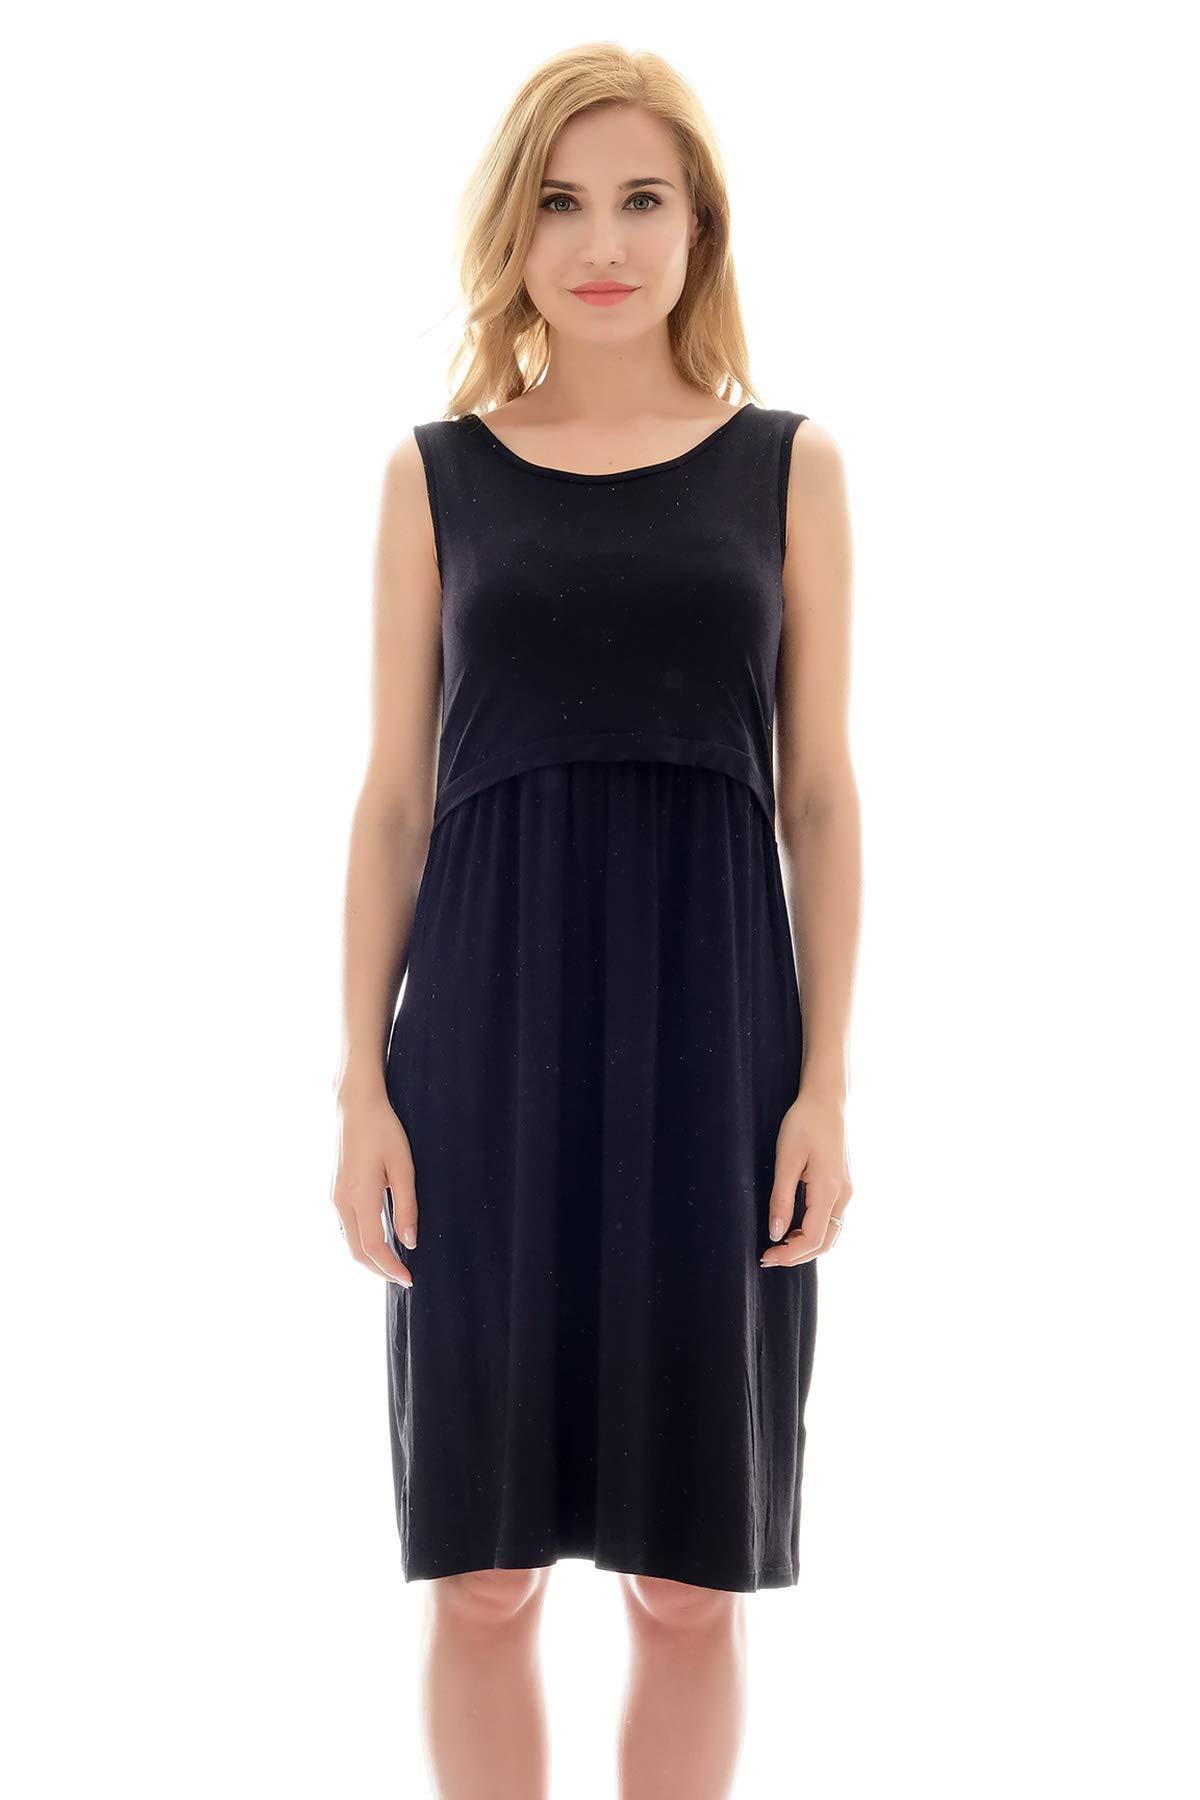 Bearsland Womens Long Sleeve Maternity Dress Nursing Breastfeeding Dress